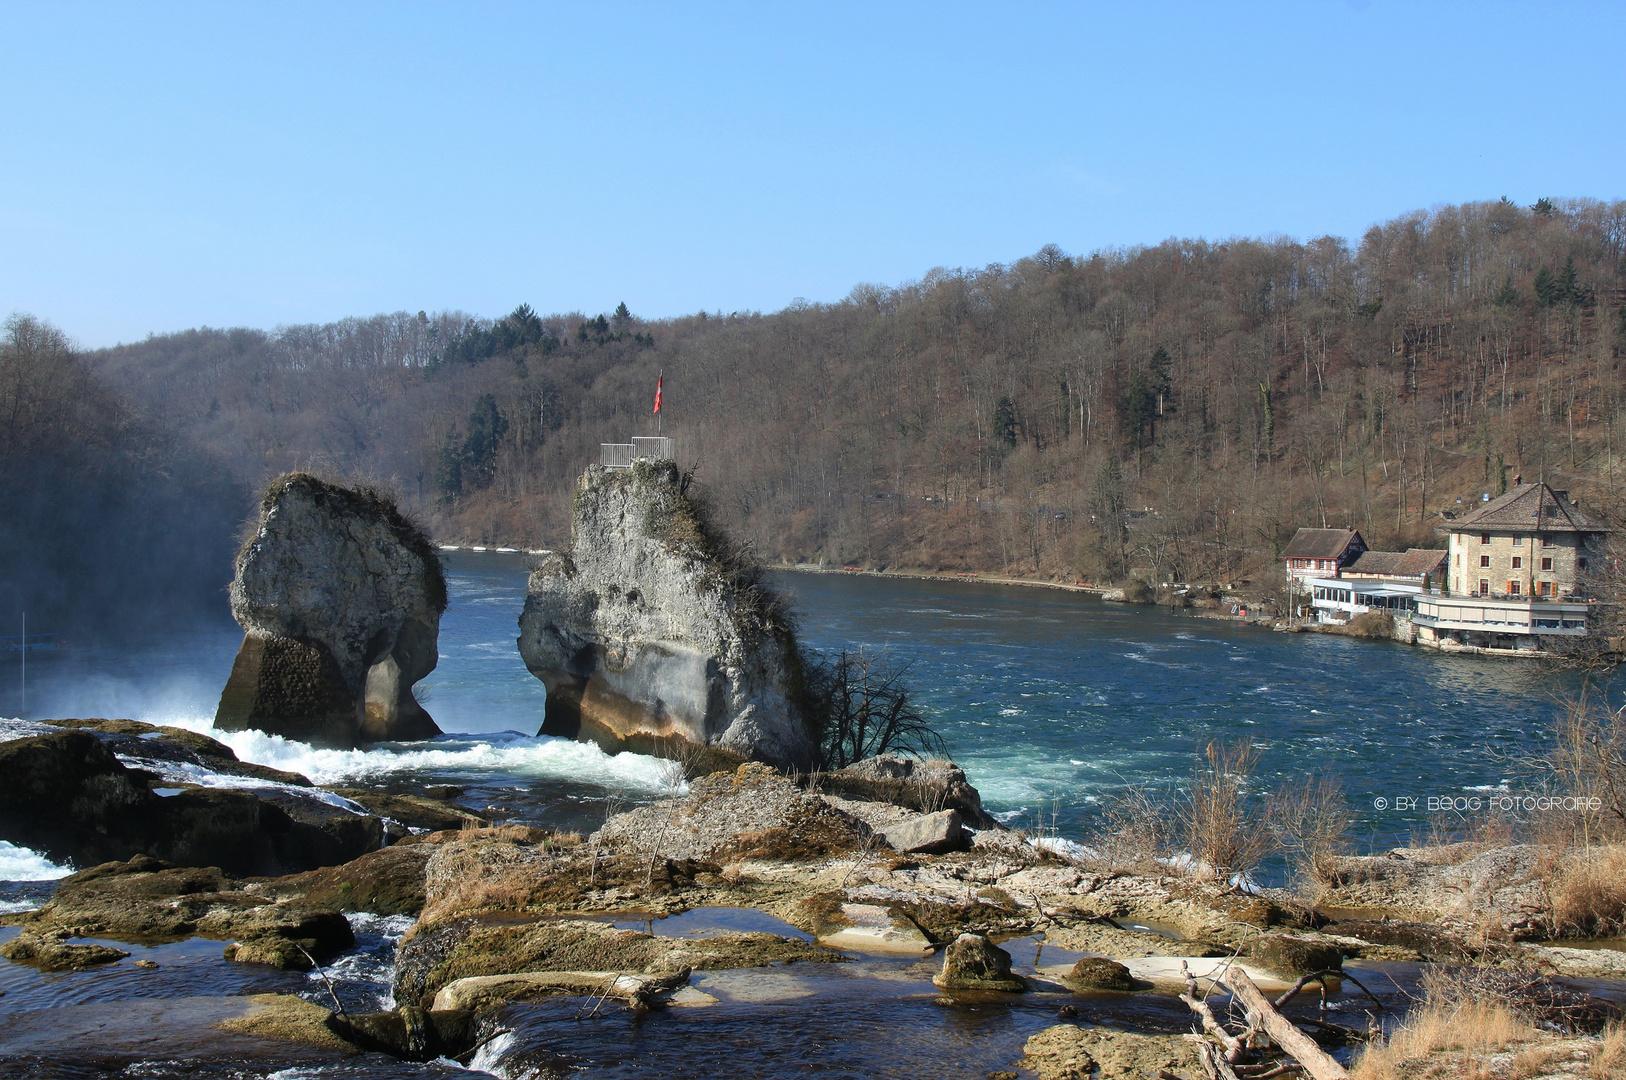 Rheinfall / .. a visit worthwhile!